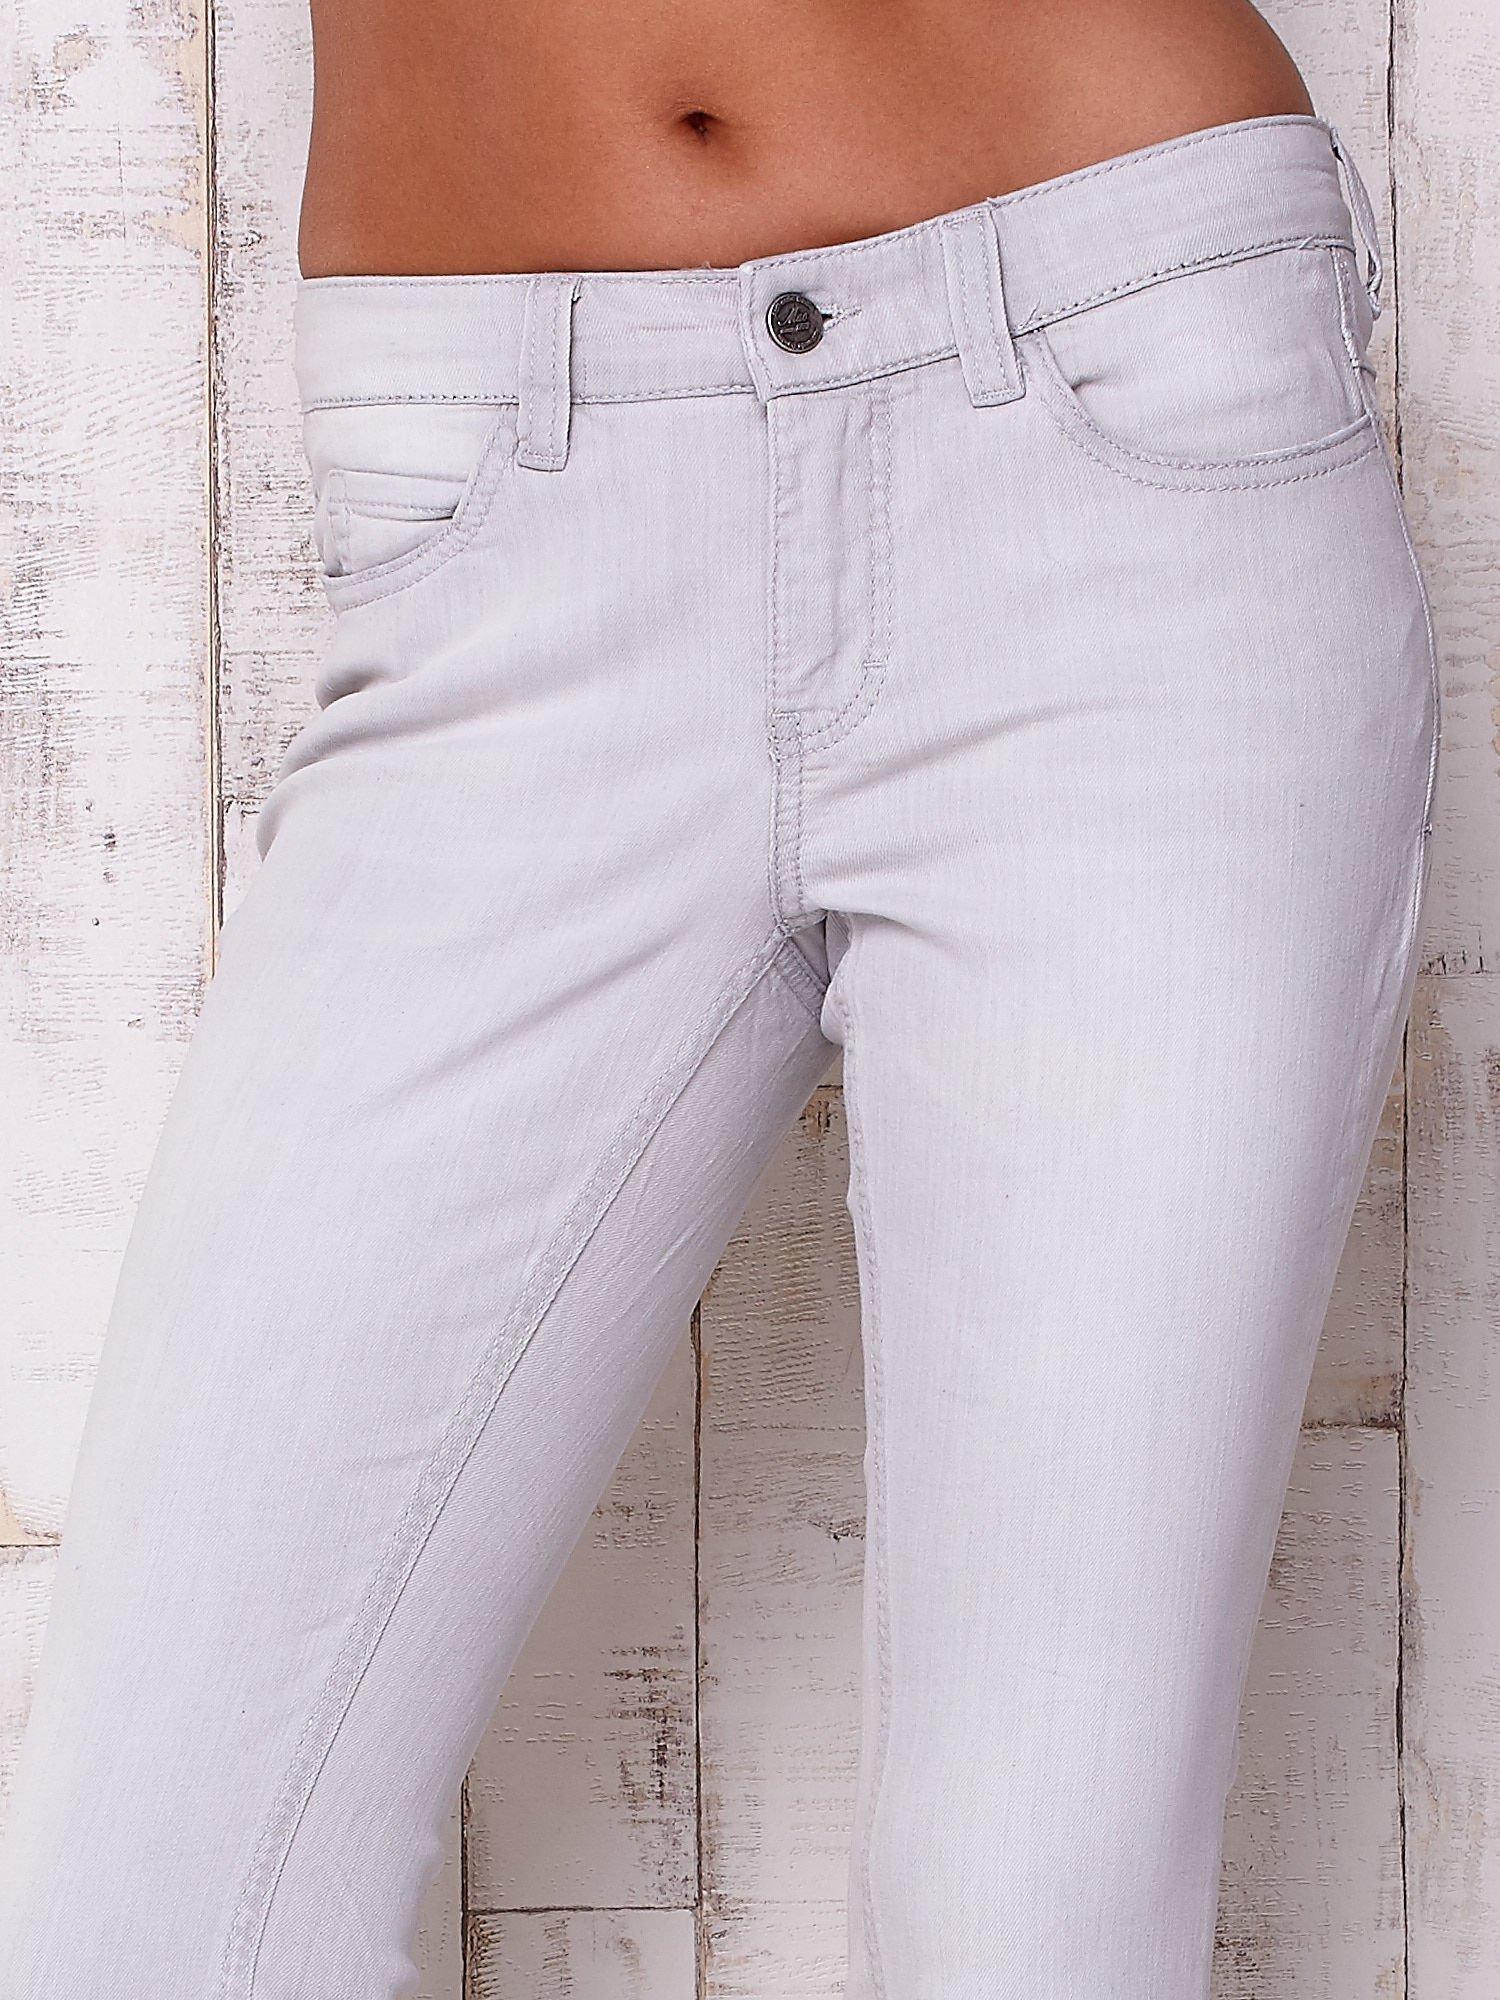 Jasnoszare spodnie o regularnym kroju                                  zdj.                                  4